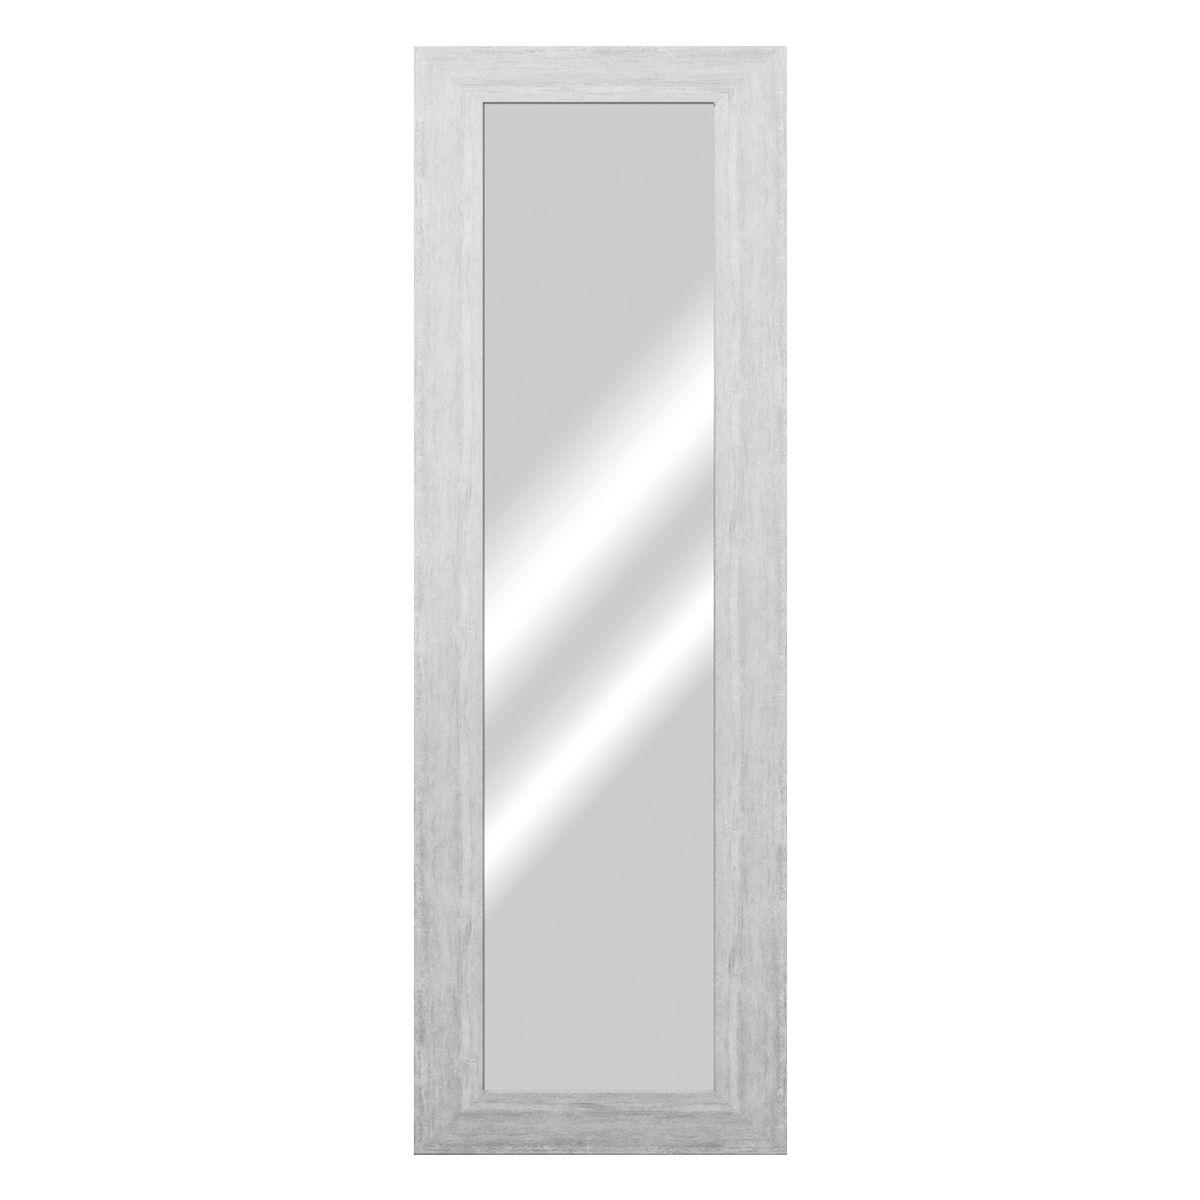 Porta a soffietto leroy merlin best porte interieure - Porta carta igienica leroy merlin ...